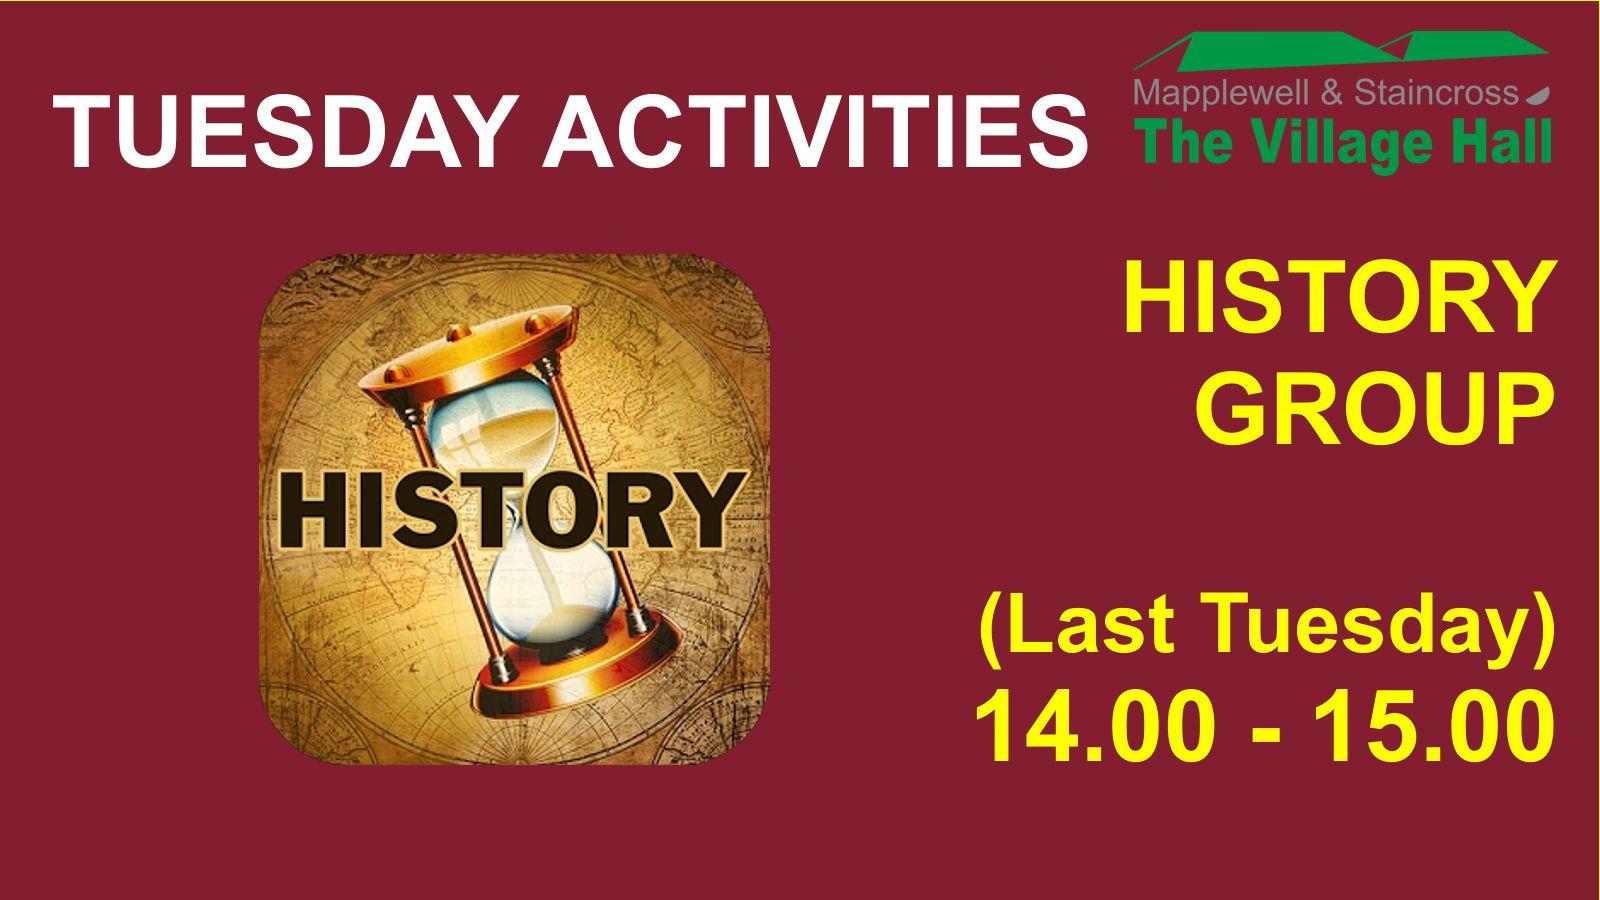 (C) Nick Hibberd - History Group